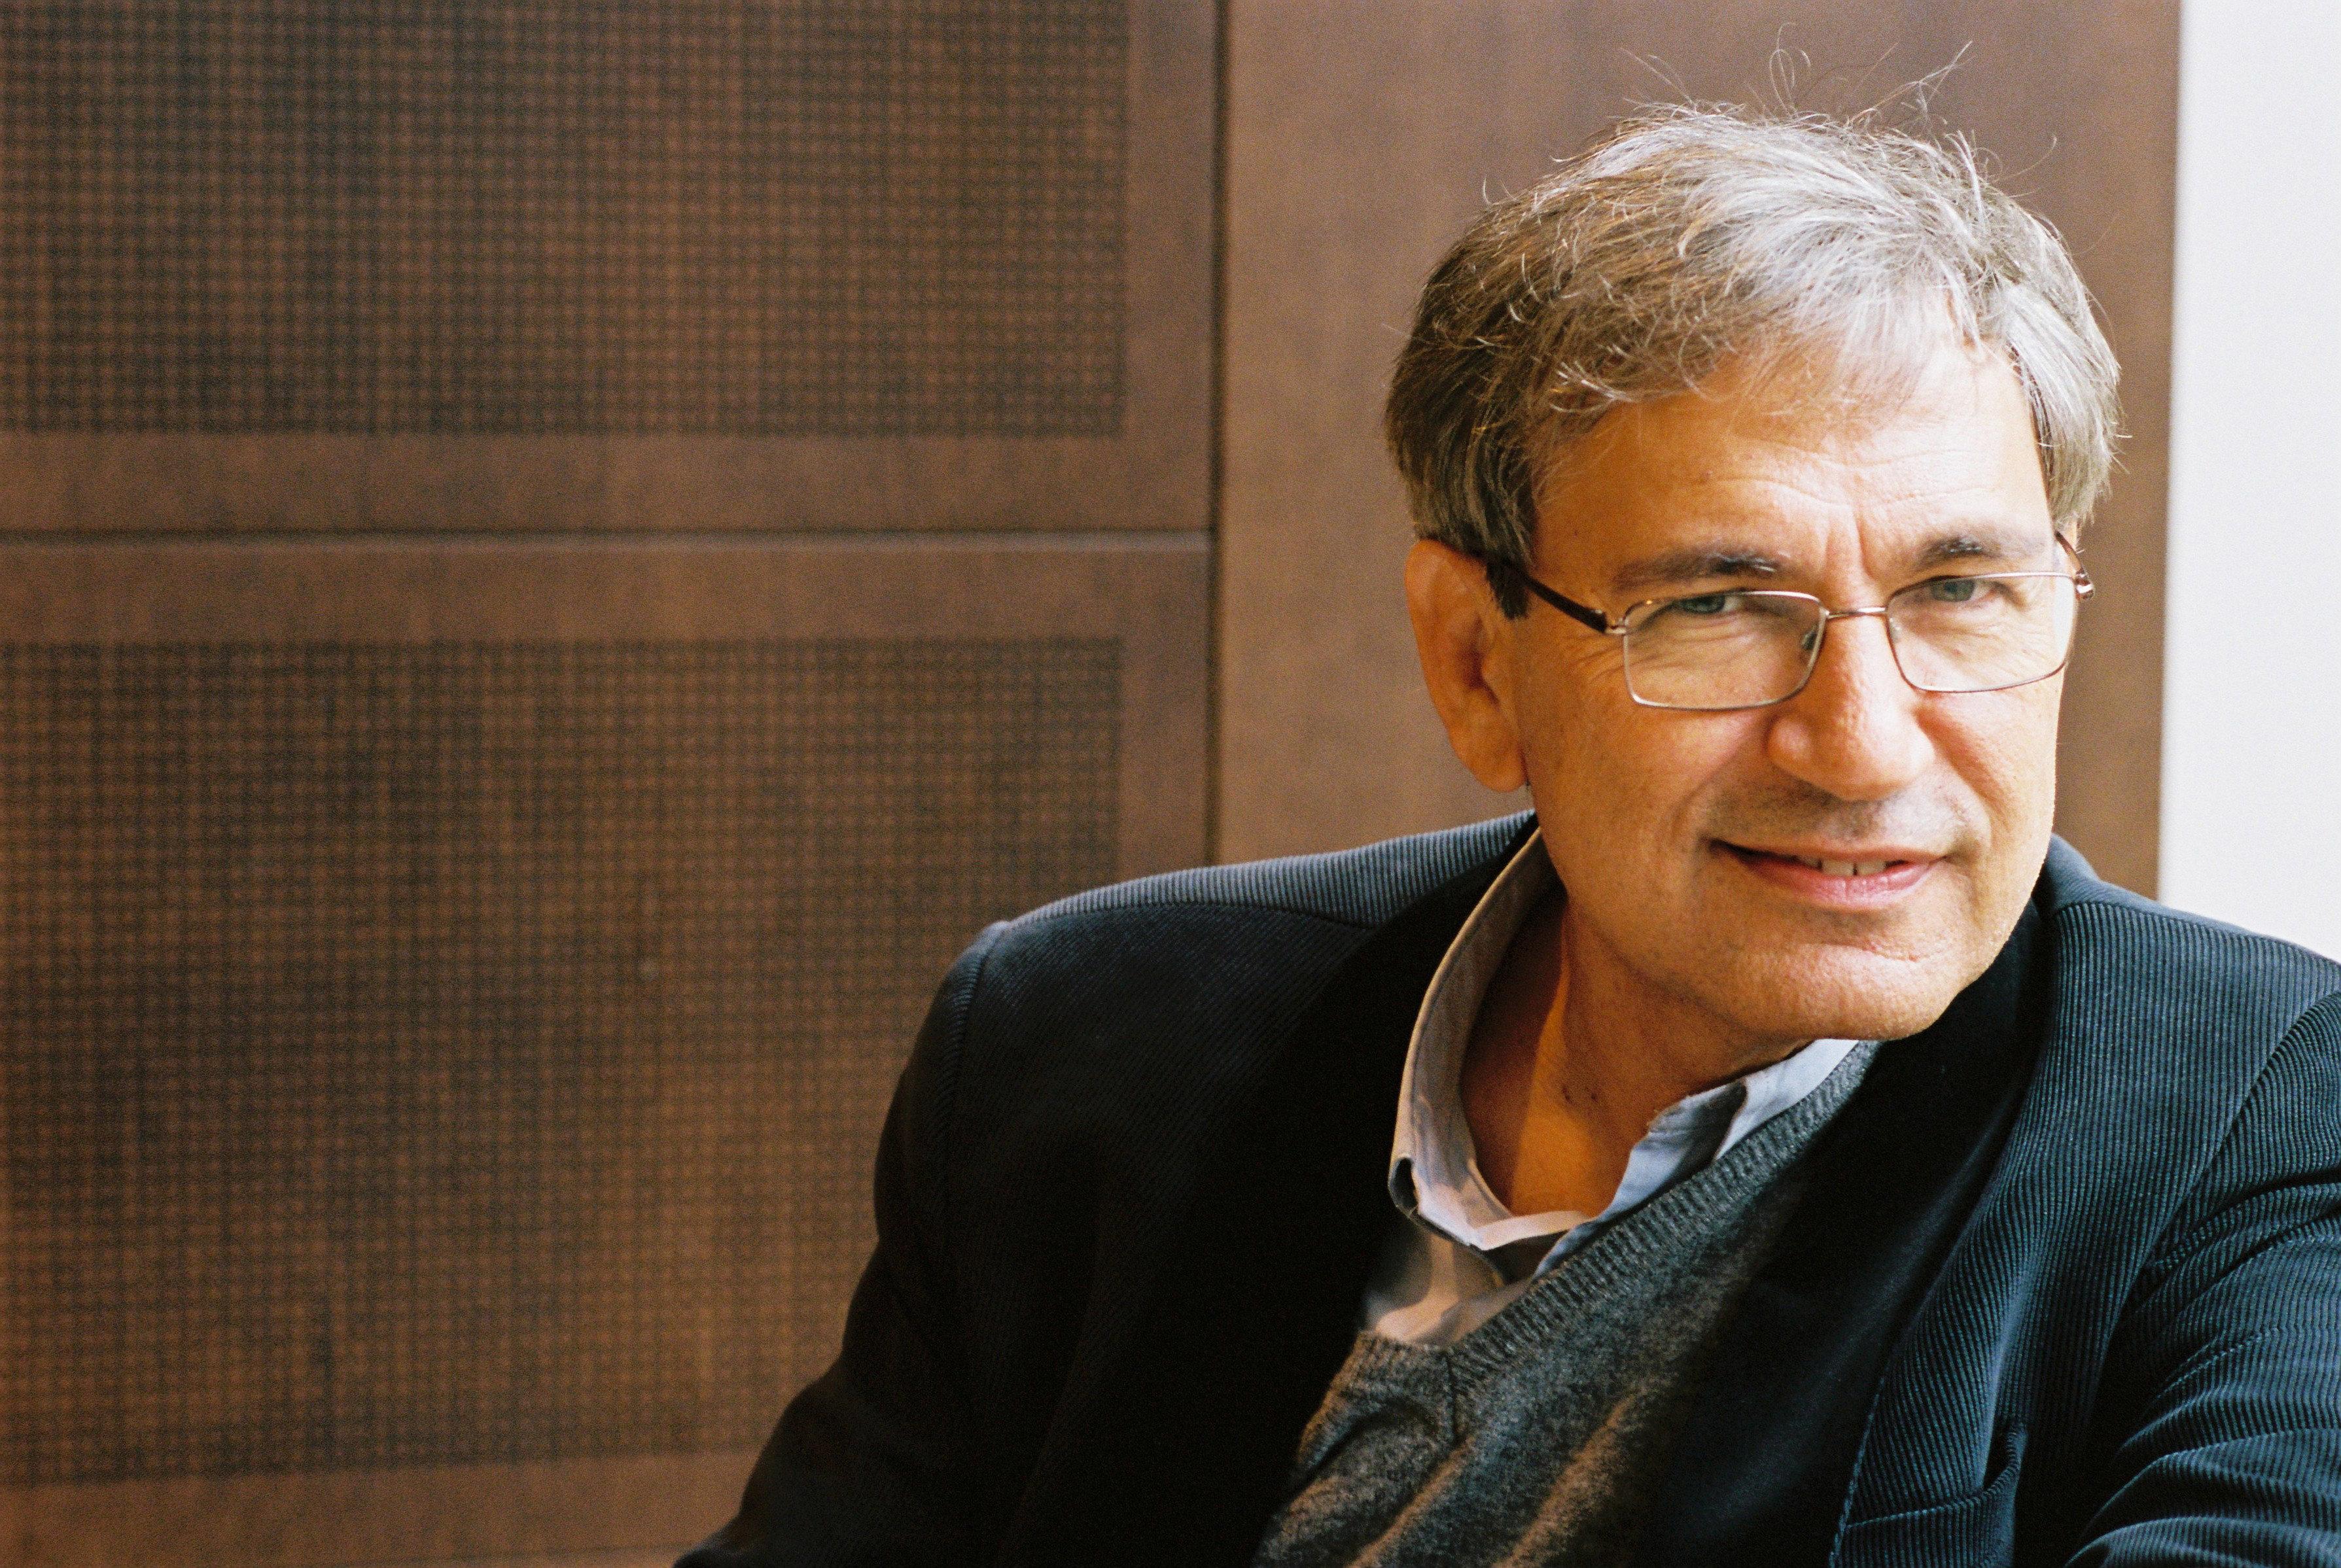 (GERMANY OUT) Pamuk, Orhan - Writer, Turkey  (Photo by Schiffer-Fuchs/ullstein bild via Getty Images)